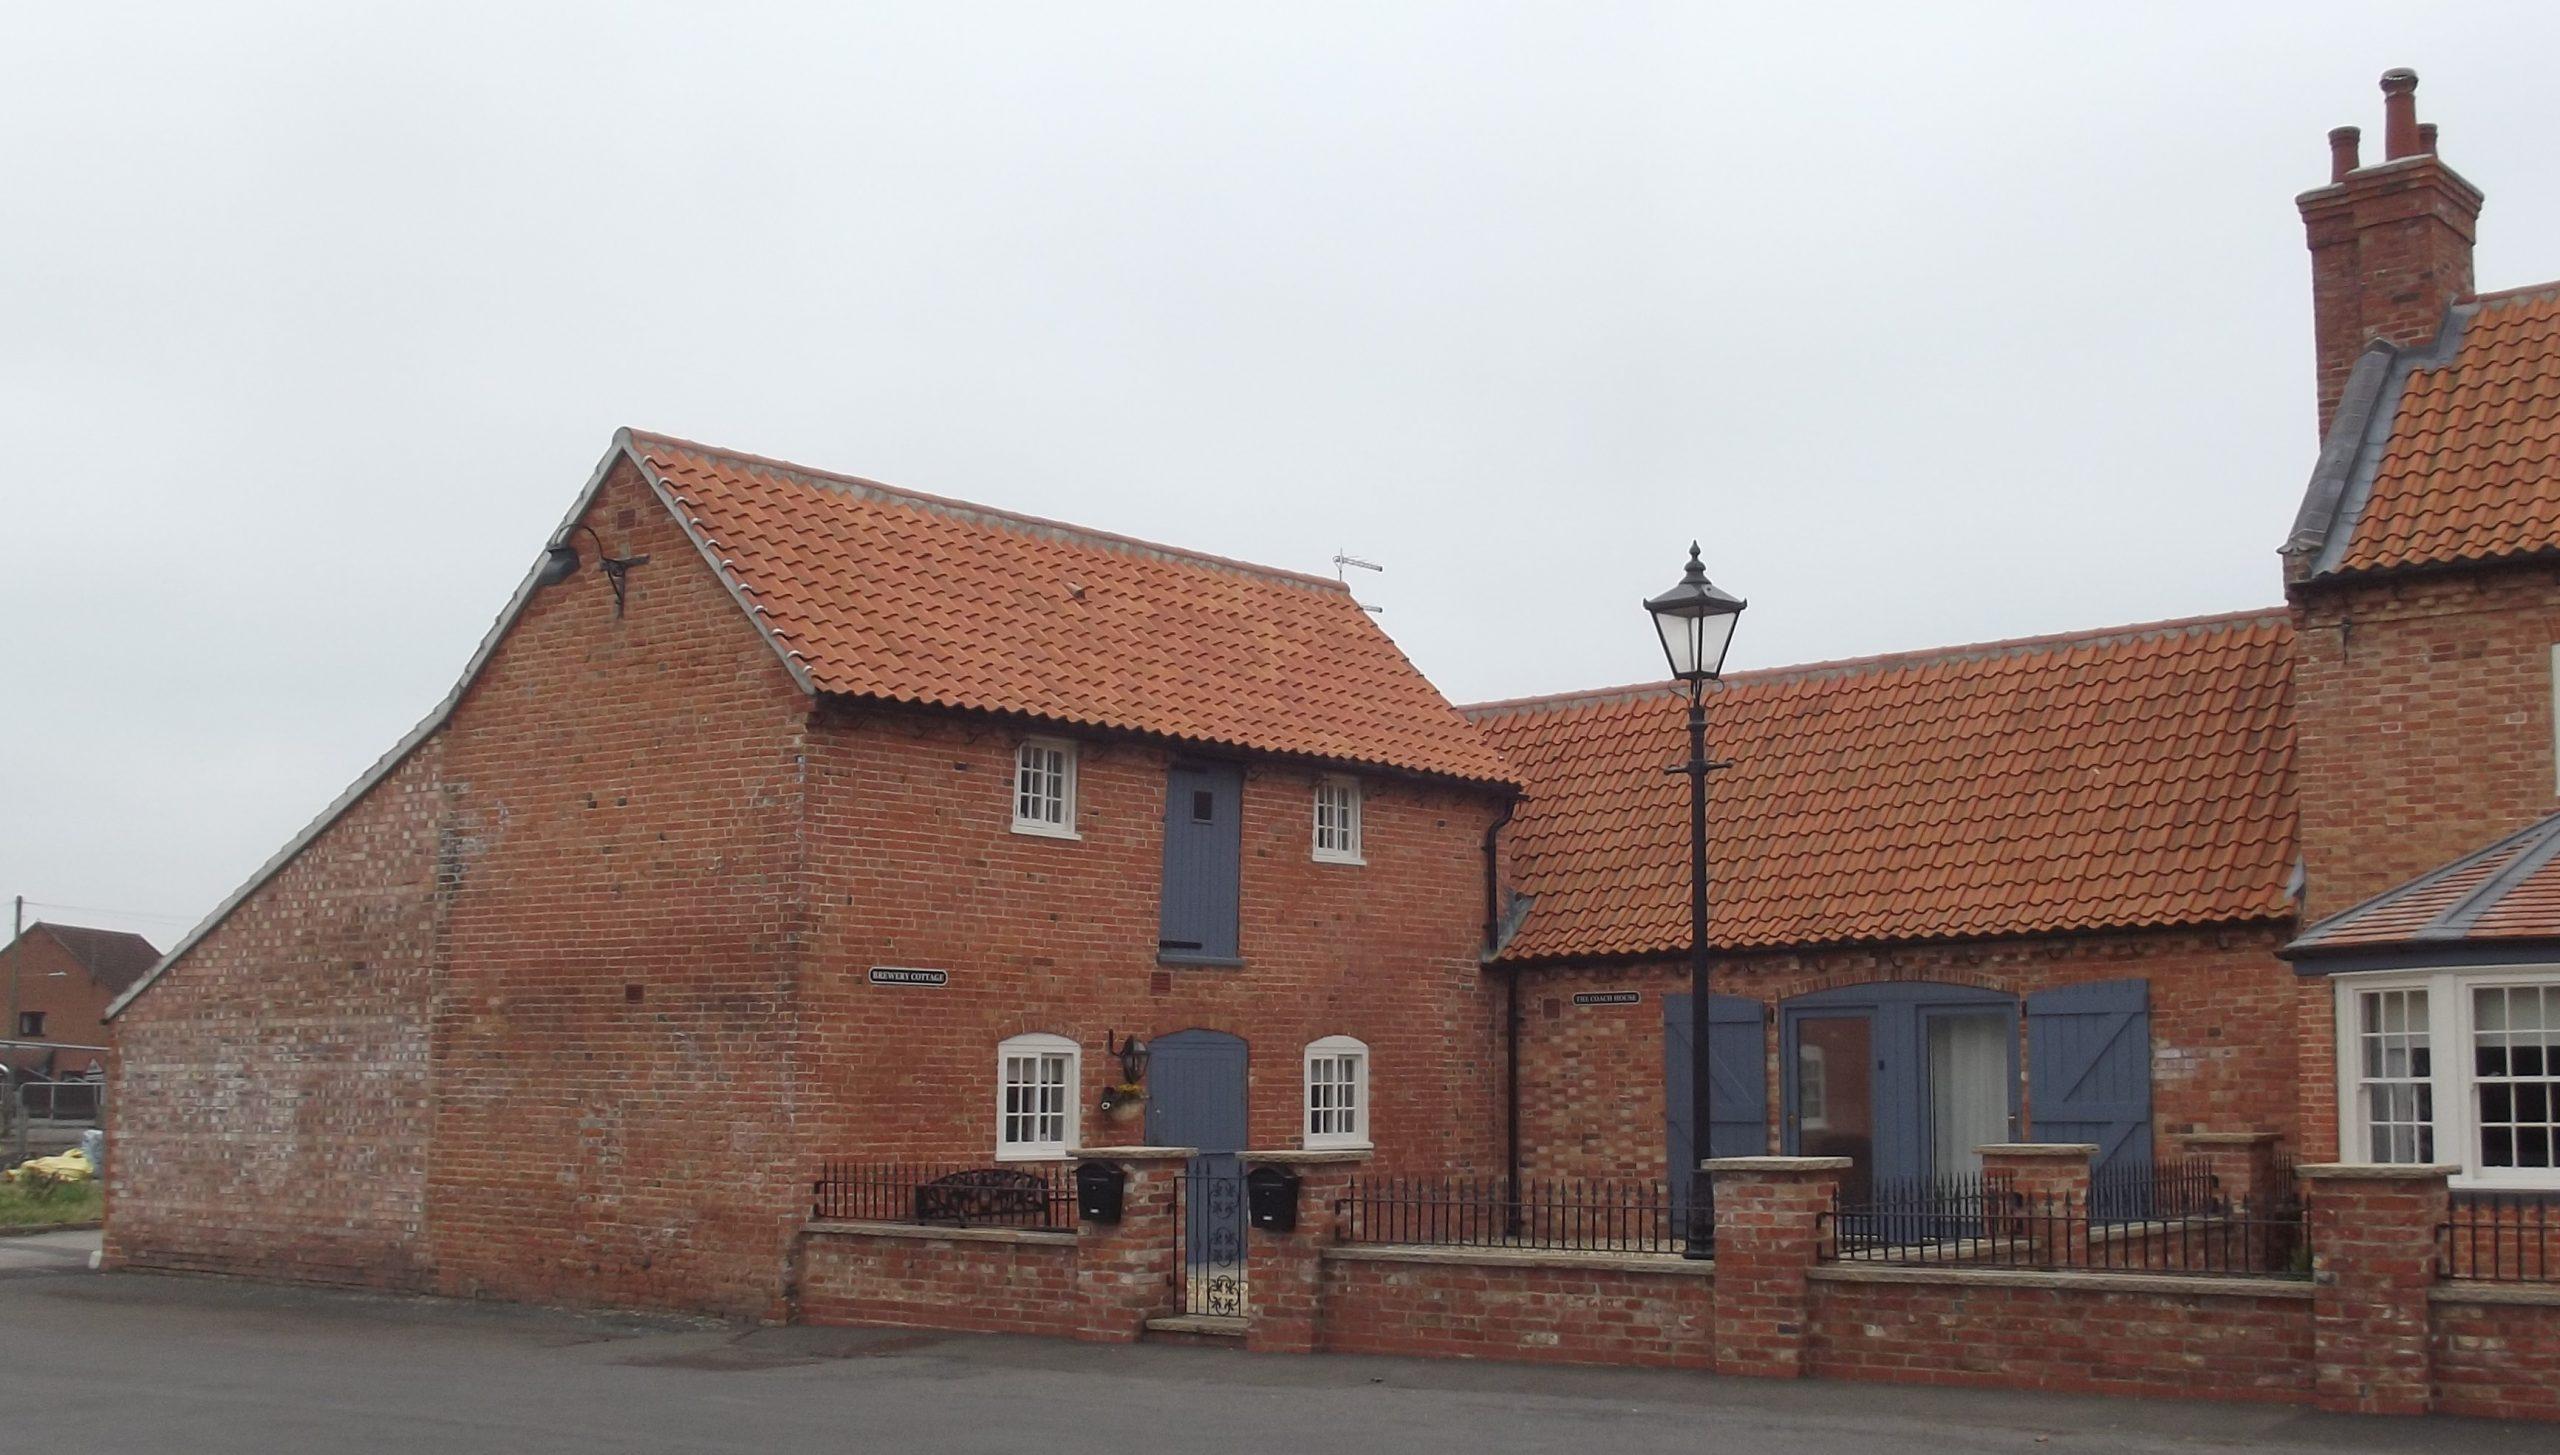 Former Nags Head Inn, Sutton on Trent 02.03.2021Close